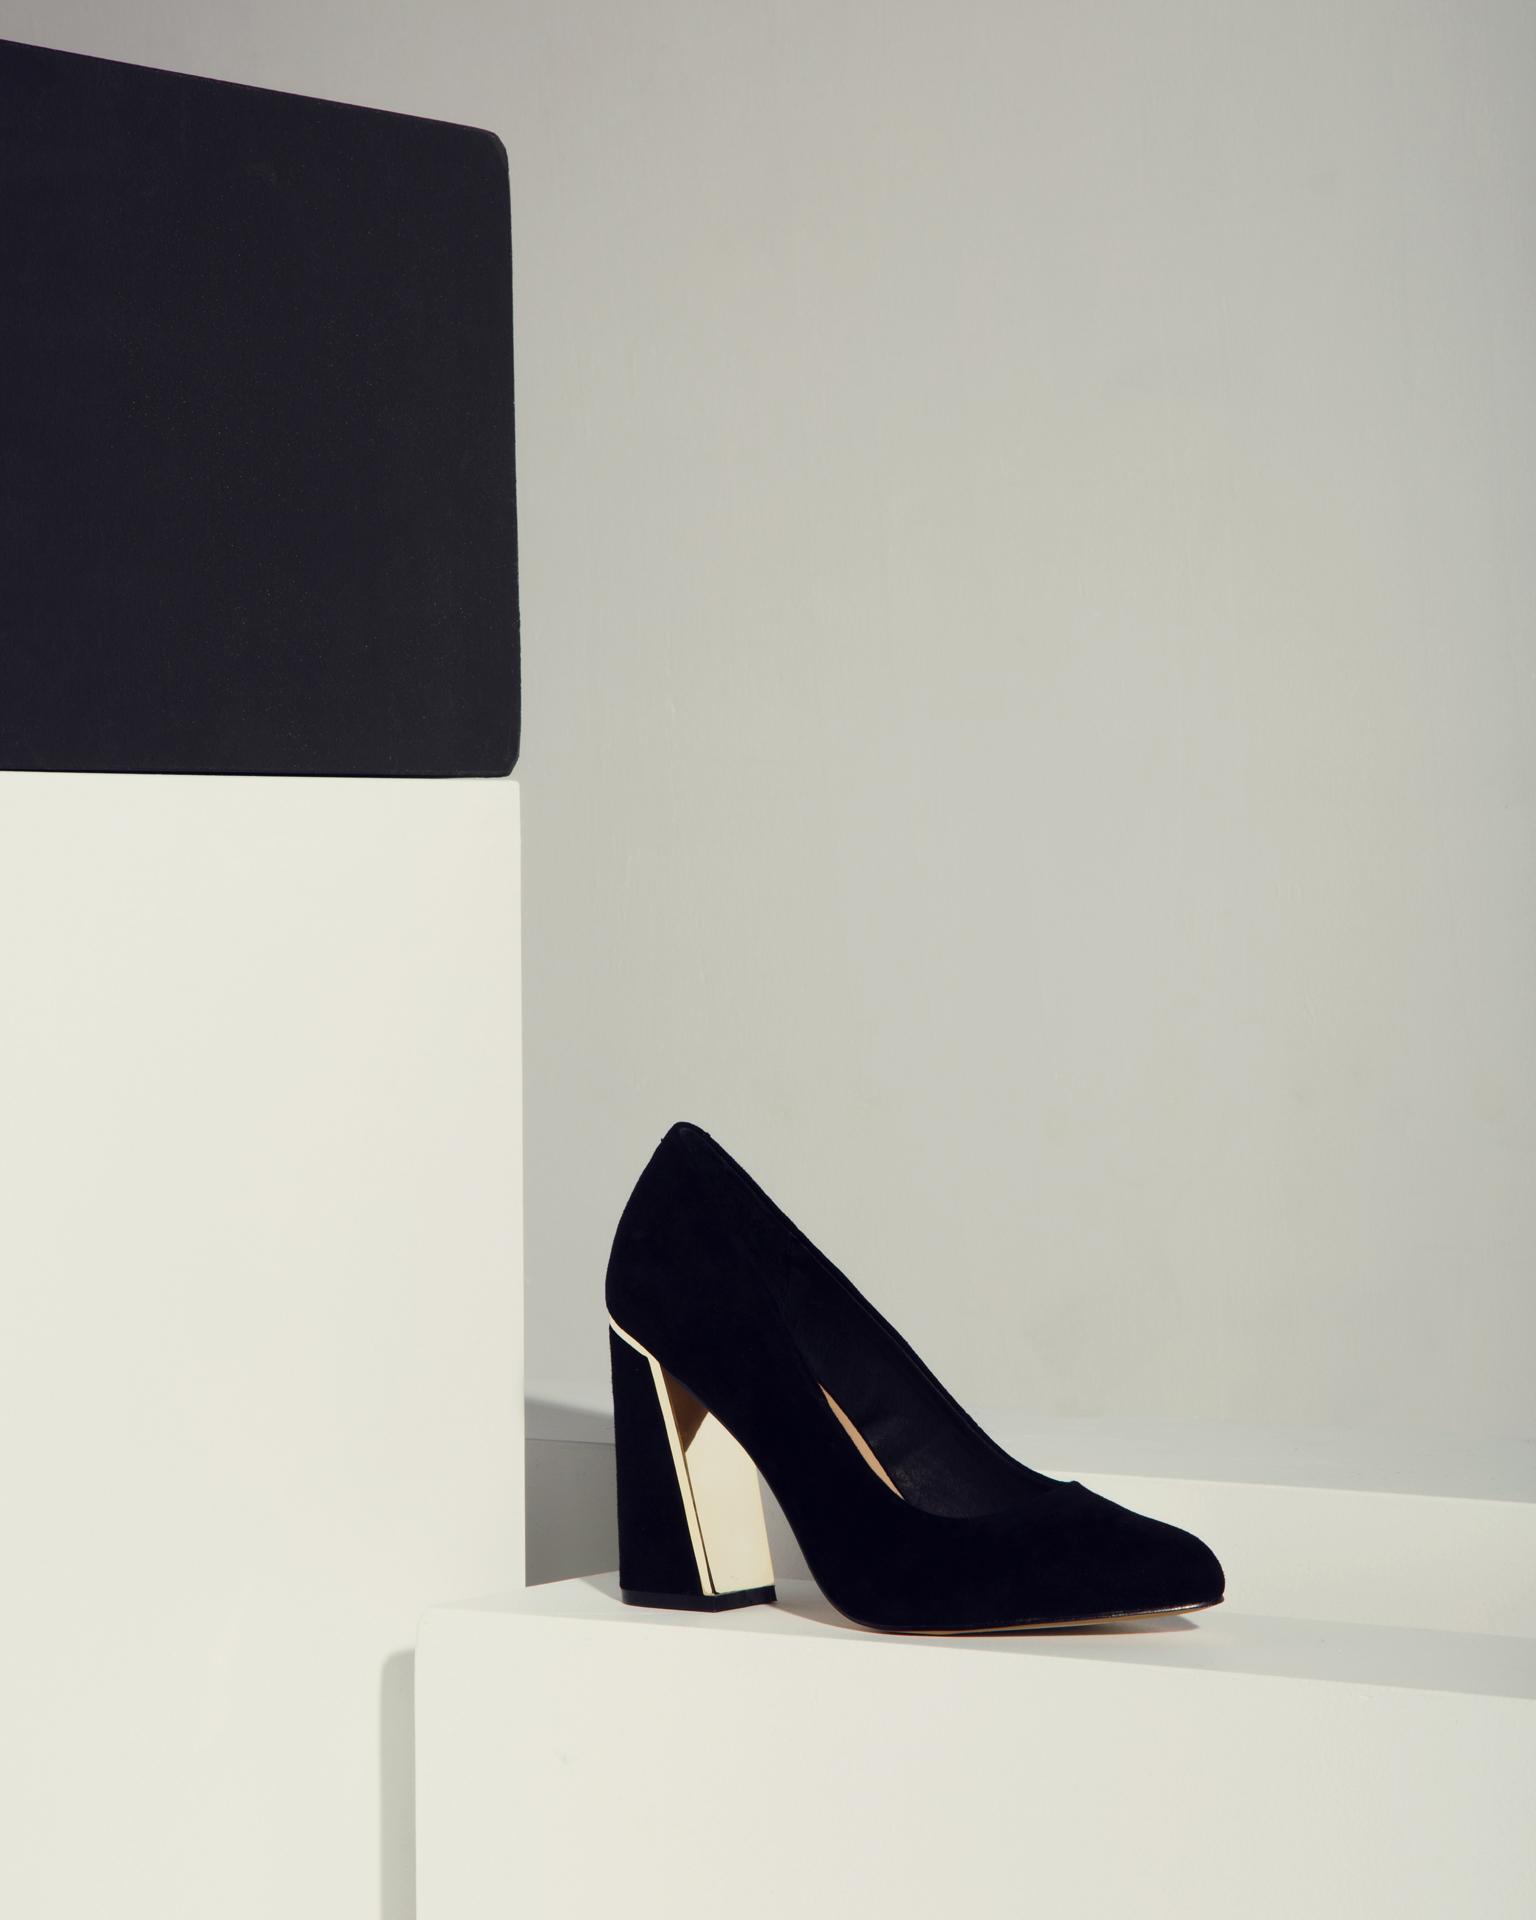 overland-footwear_Photography_Product_Studio_New-Zealand_04_web.jpg